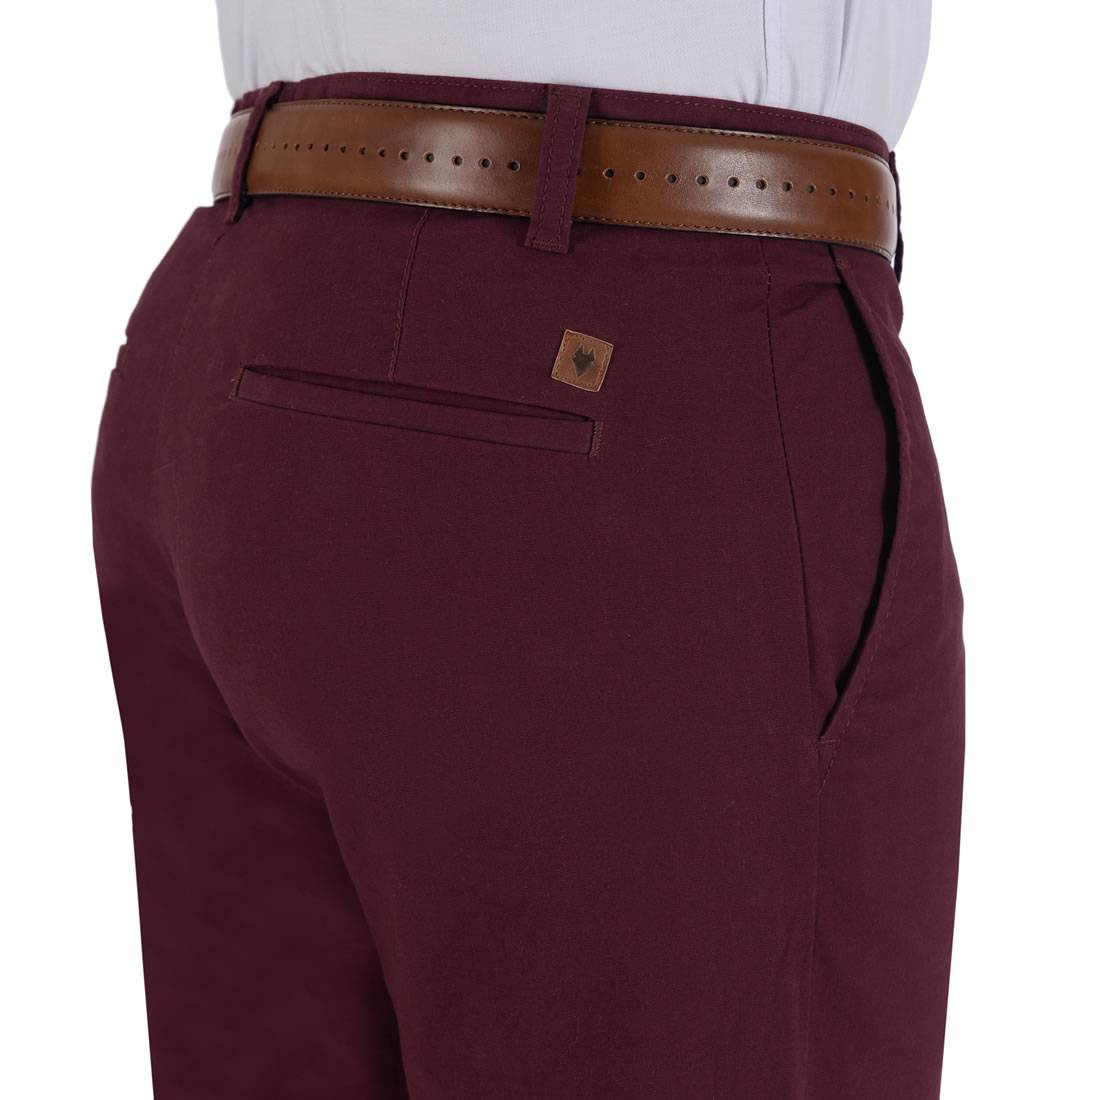 010811077434-04-Pantalon-Casual-Sin-Pinzas-Classic-Fit-Con-Elastano-Vino-yale